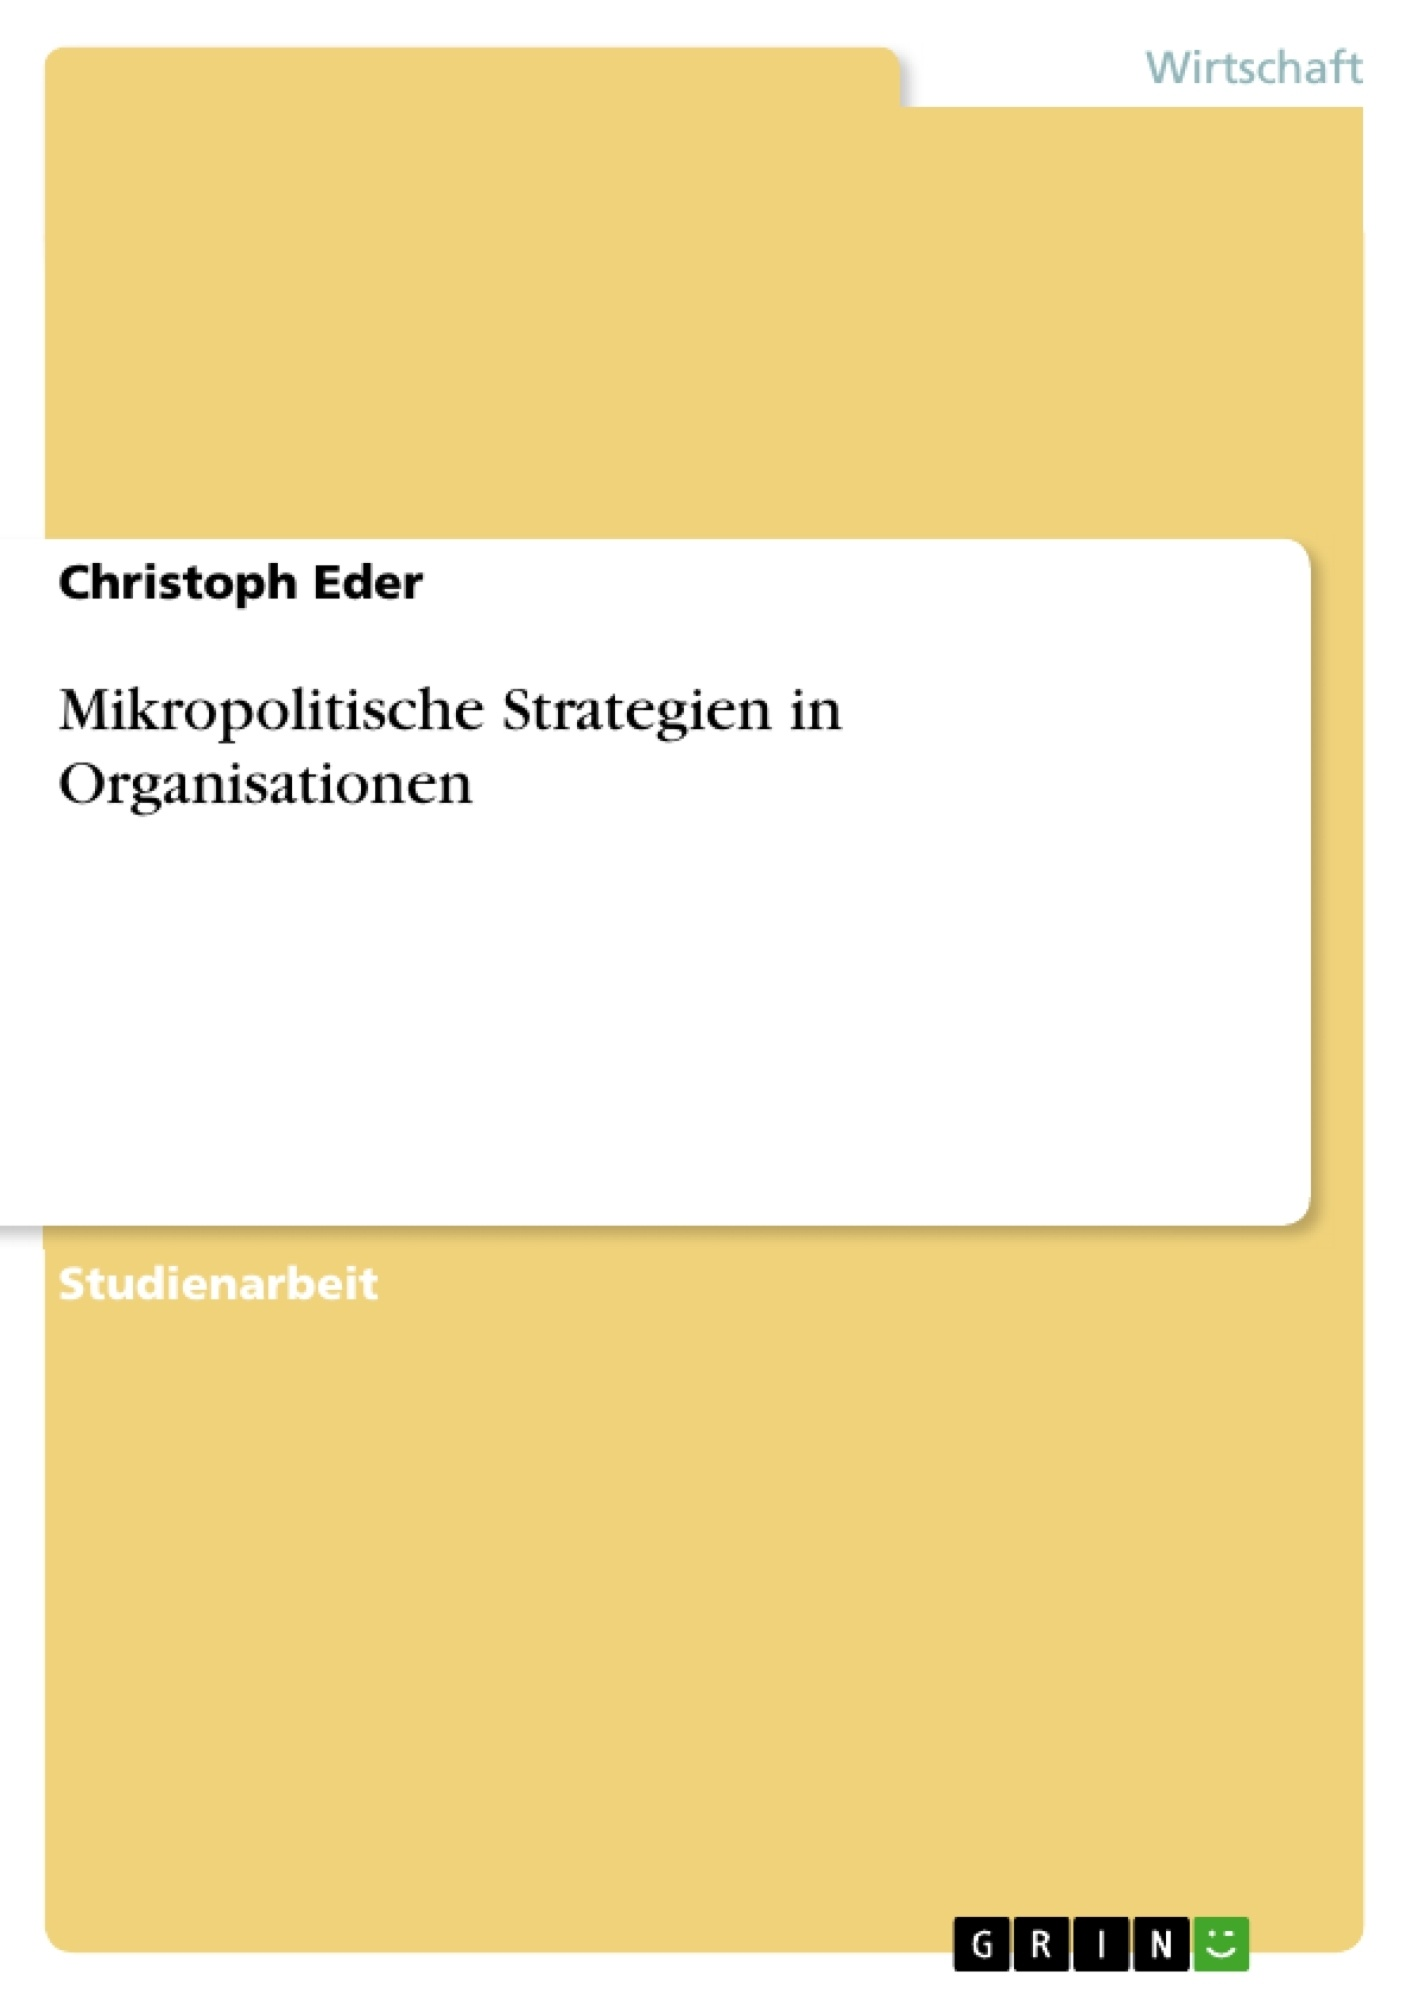 Titel: Mikropolitische Strategien in Organisationen